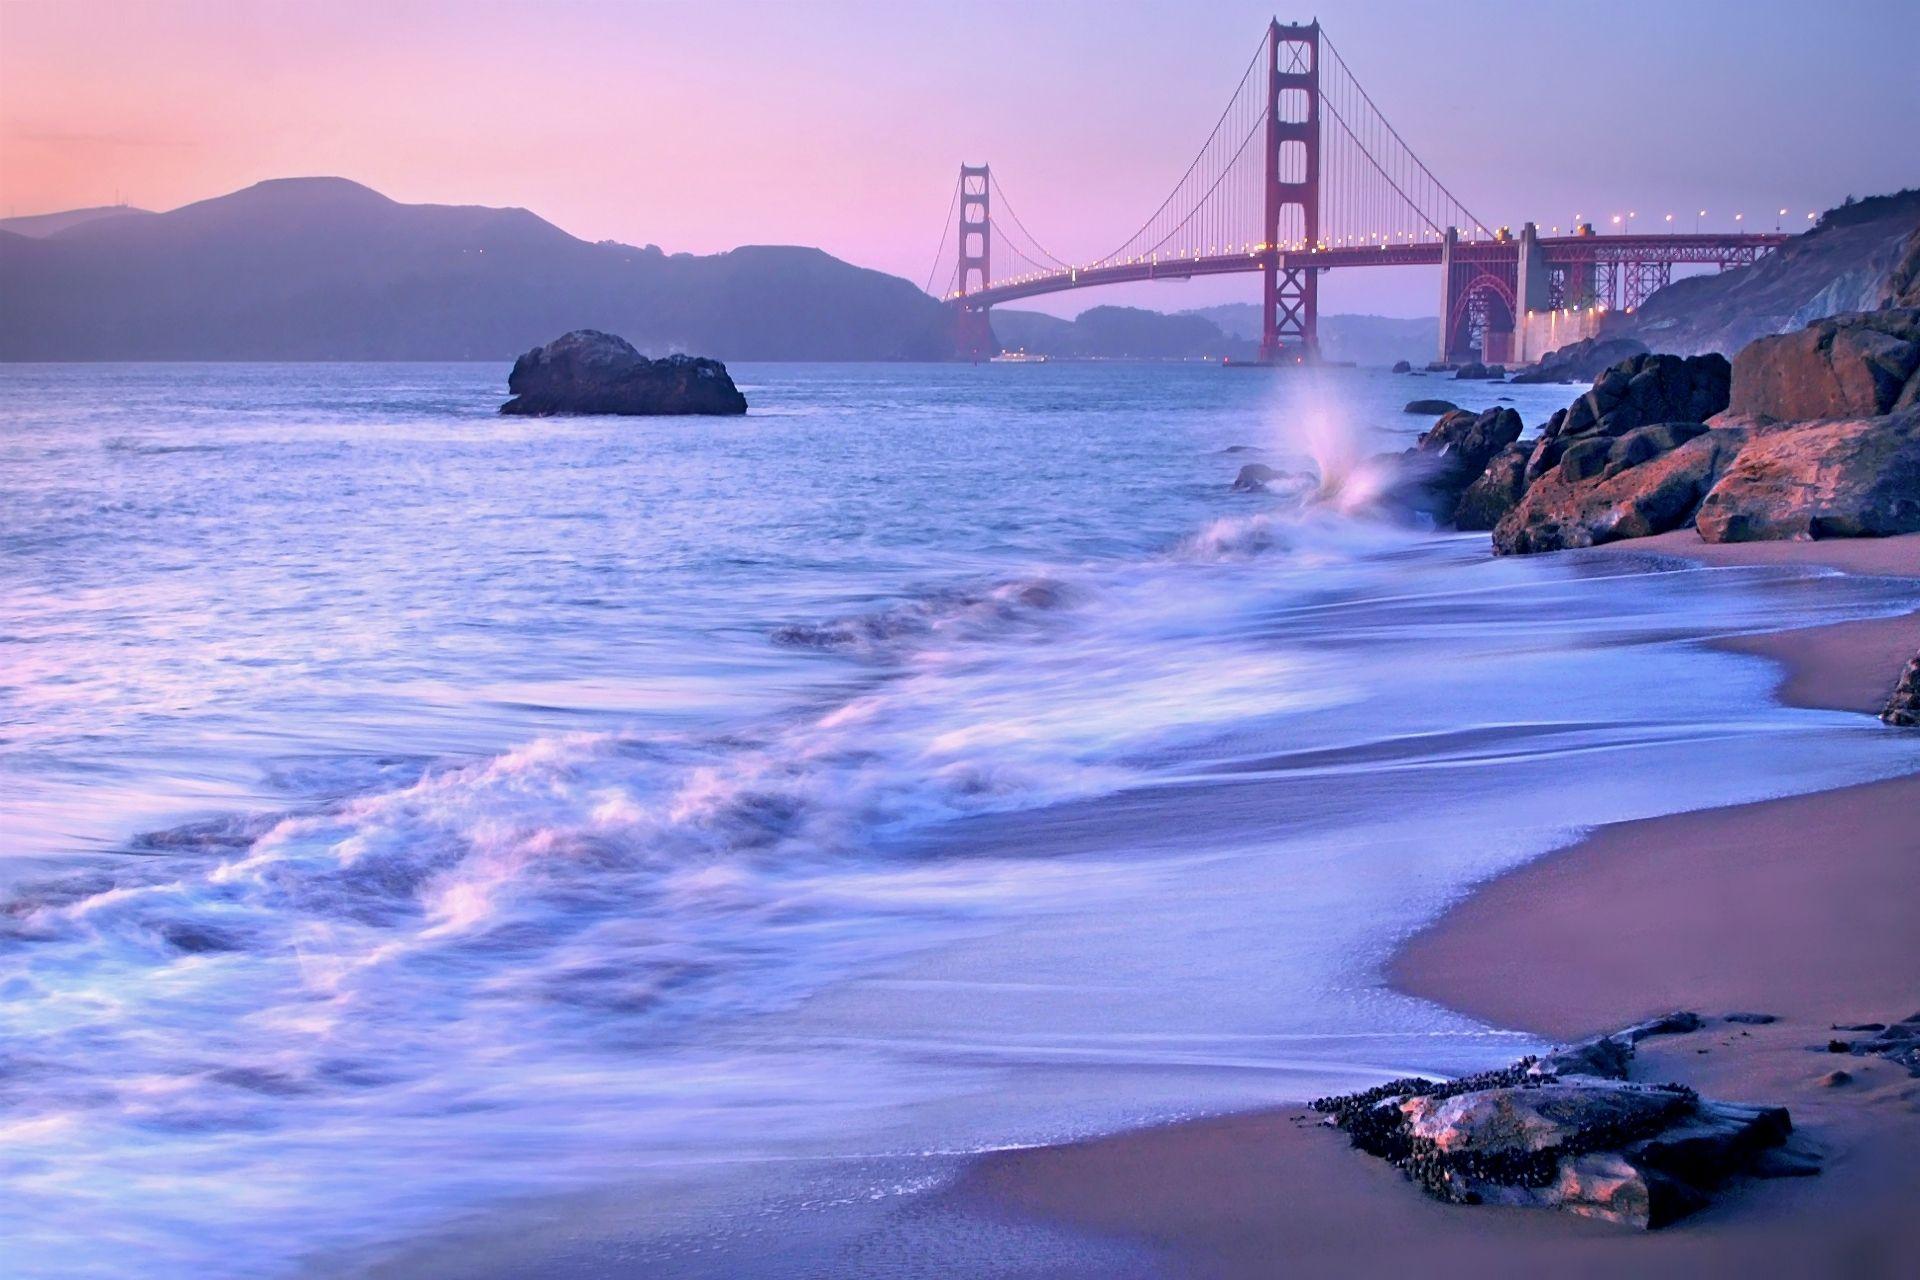 USA California San Francisco hd wallpaper Background HD Wallpaper 1920x1280